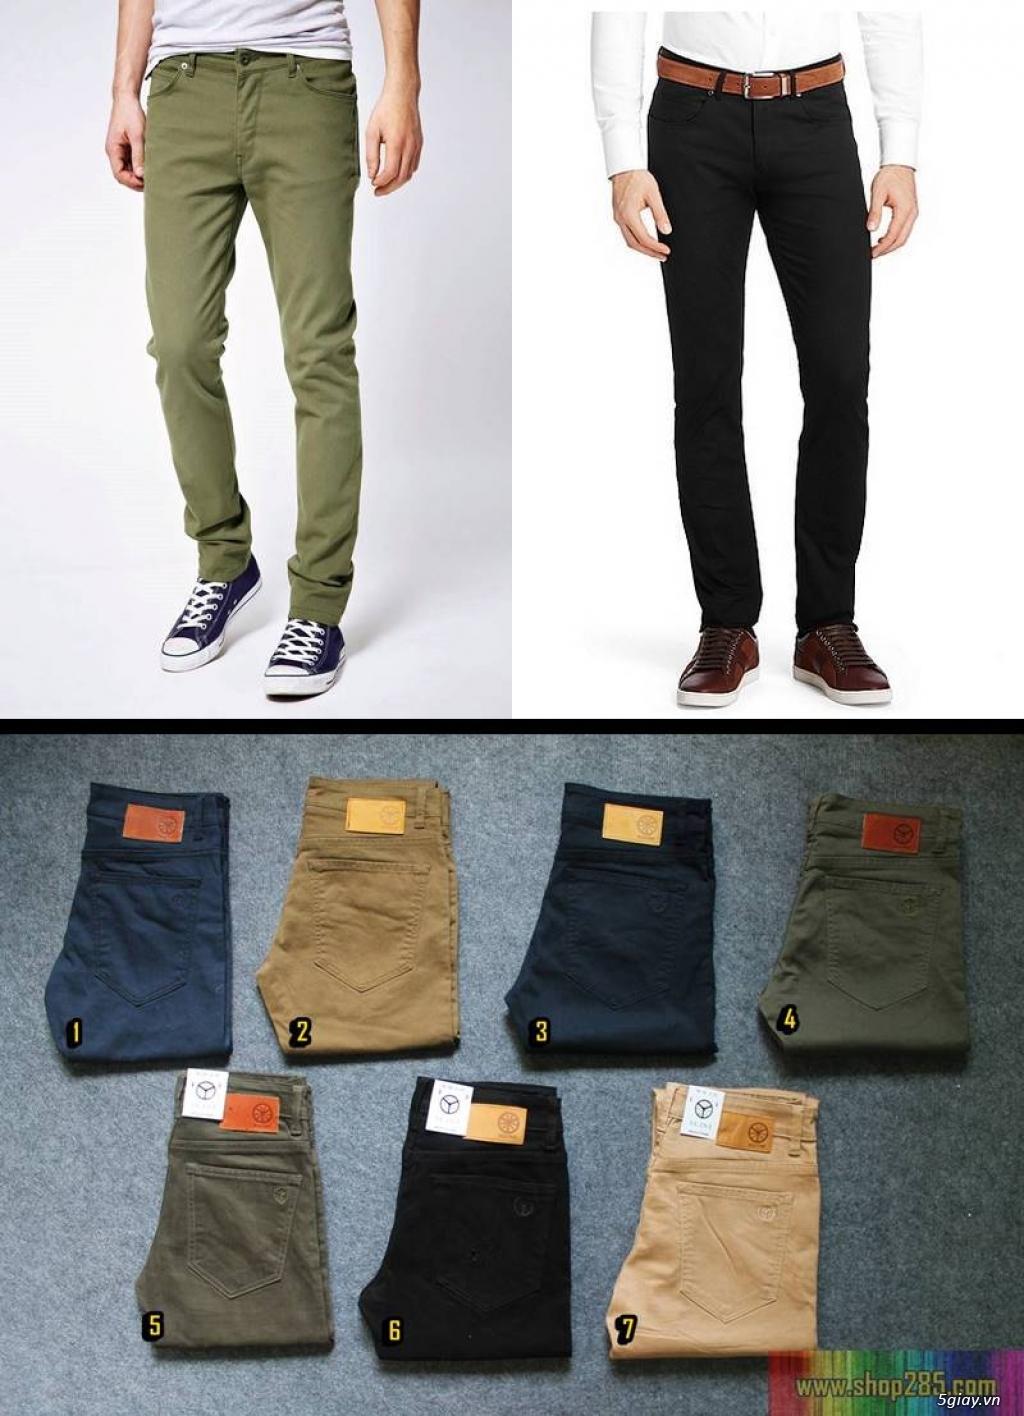 Shop285.com - Shop quần áo : Zara,Jules,Jake*s,,Hollister,Aber,CK,Tommy,Levis - 33